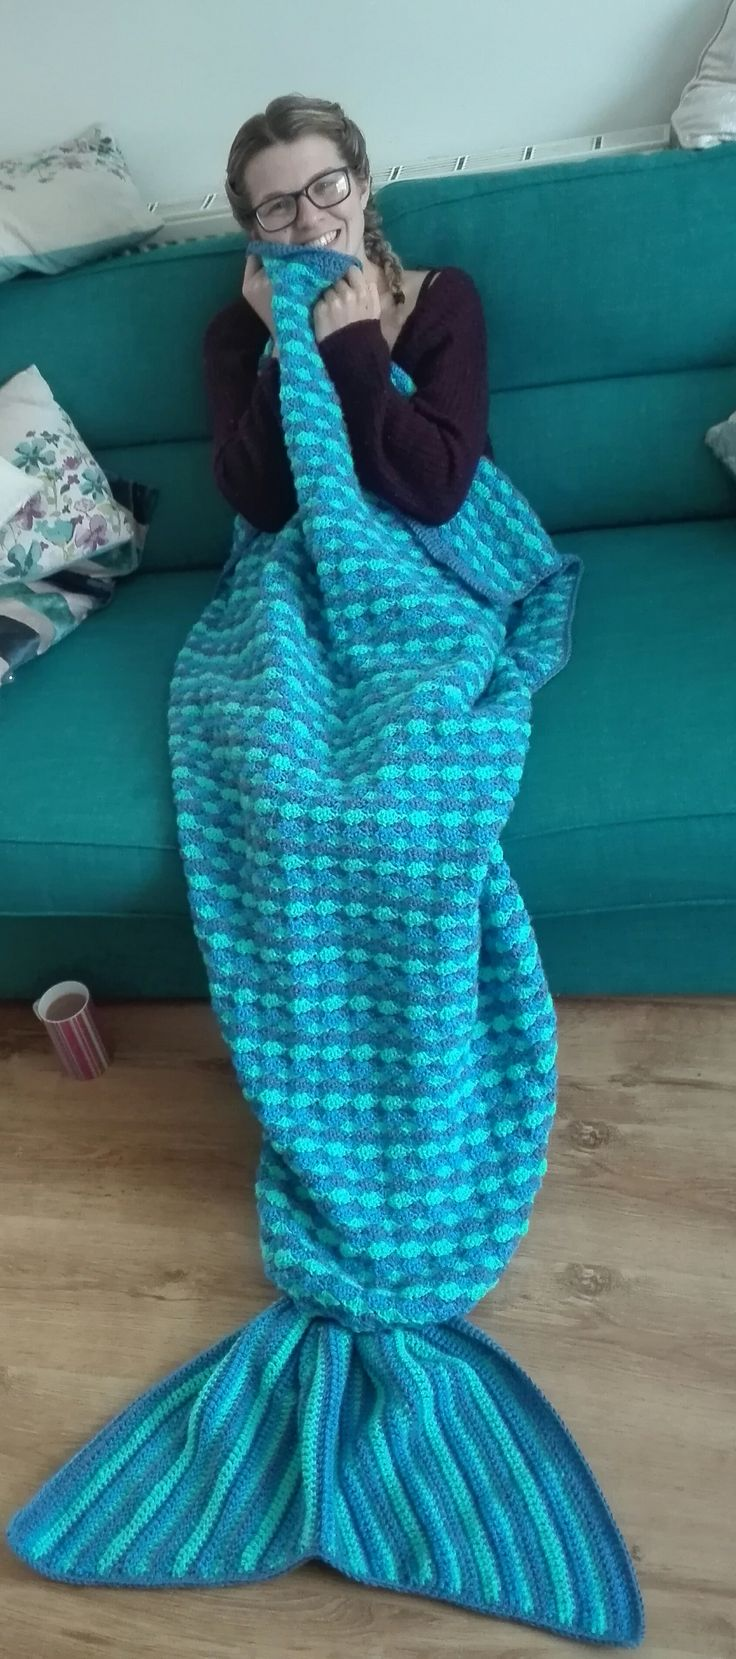 42 best Snuggle images on Pinterest | Meerjungfrauschwänze ...